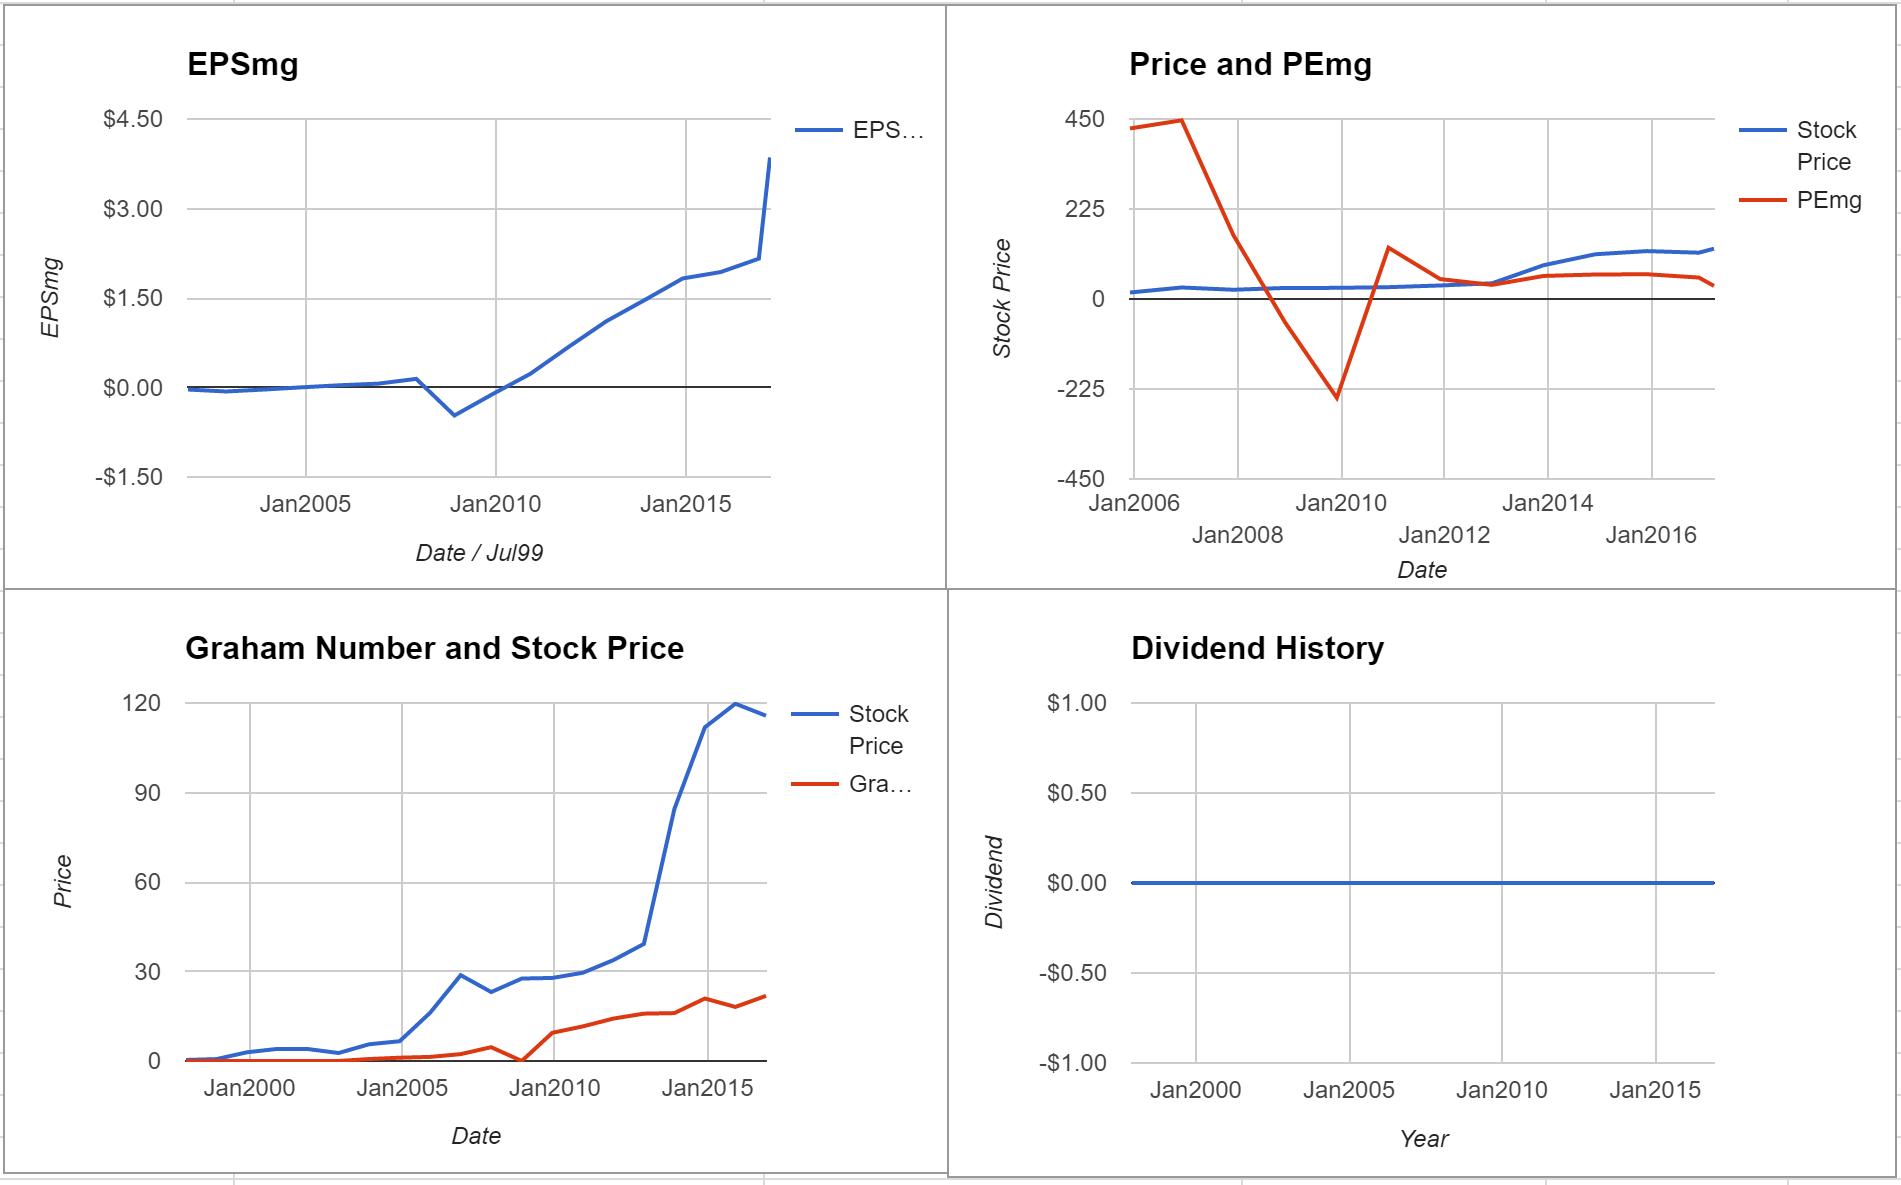 Celgene Corporation Valuation – March 2017 $CELG